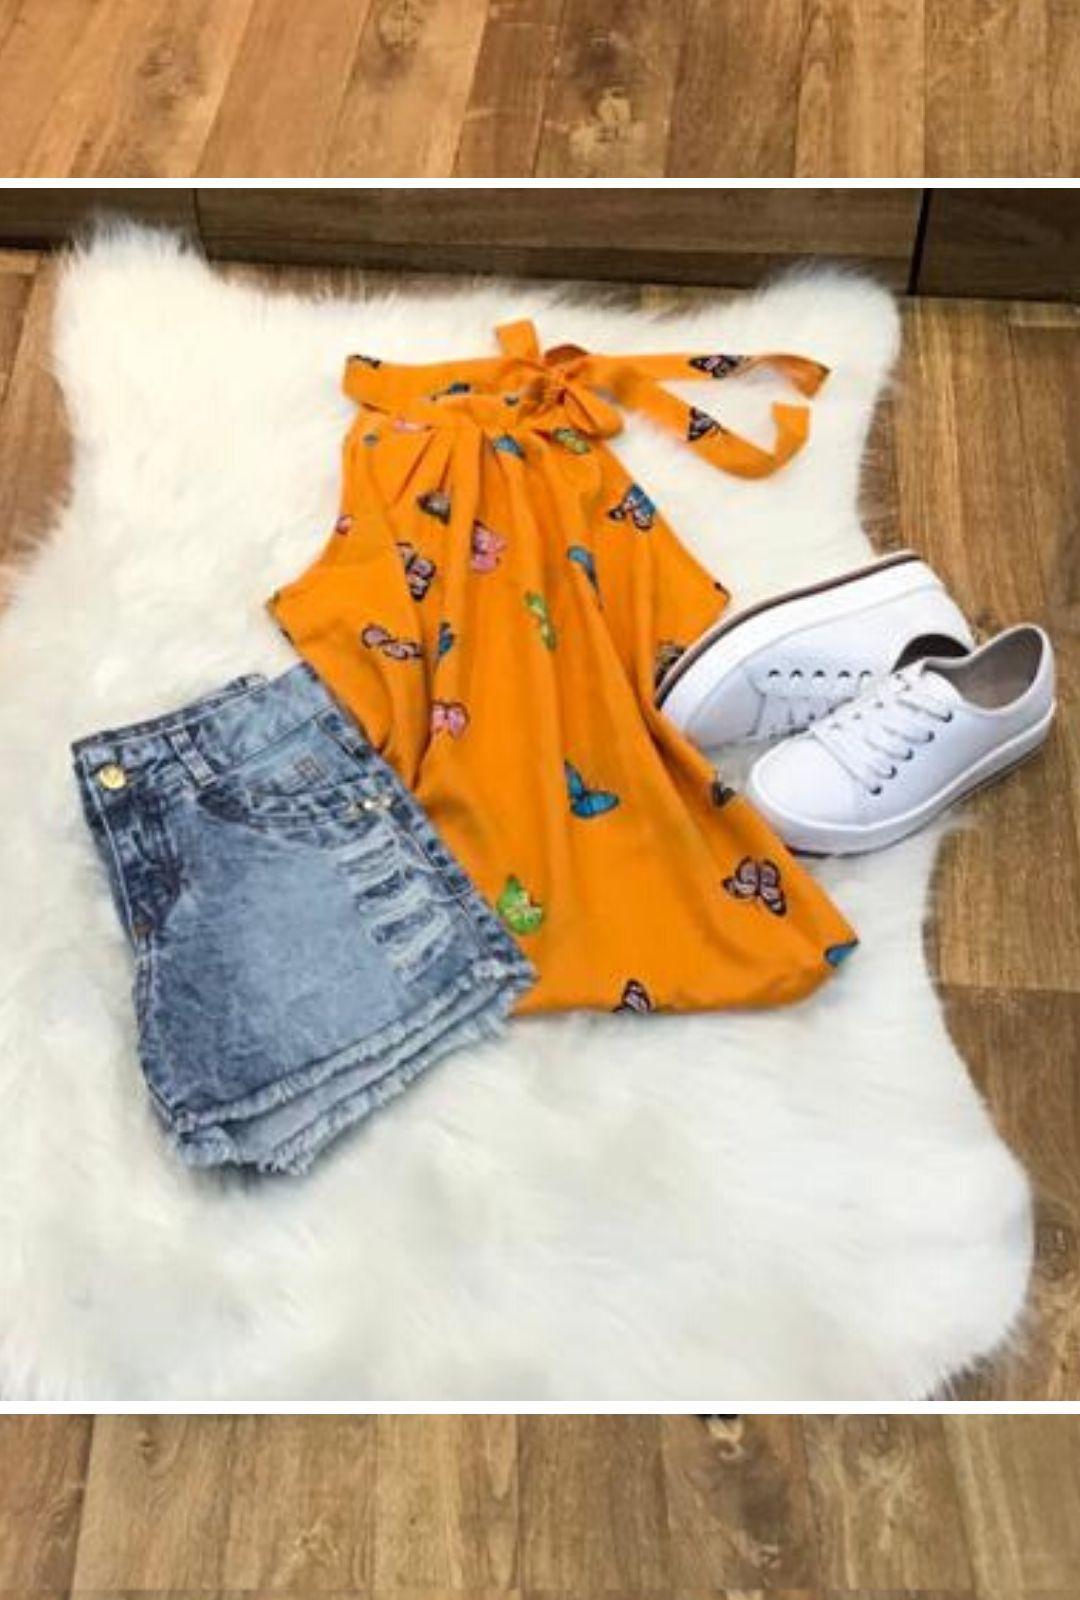 Blusa Camisa Regata Feminina Laço Pescoço Gola Alta Social Laranja Estampada  - ModaStore | Moda Feminina